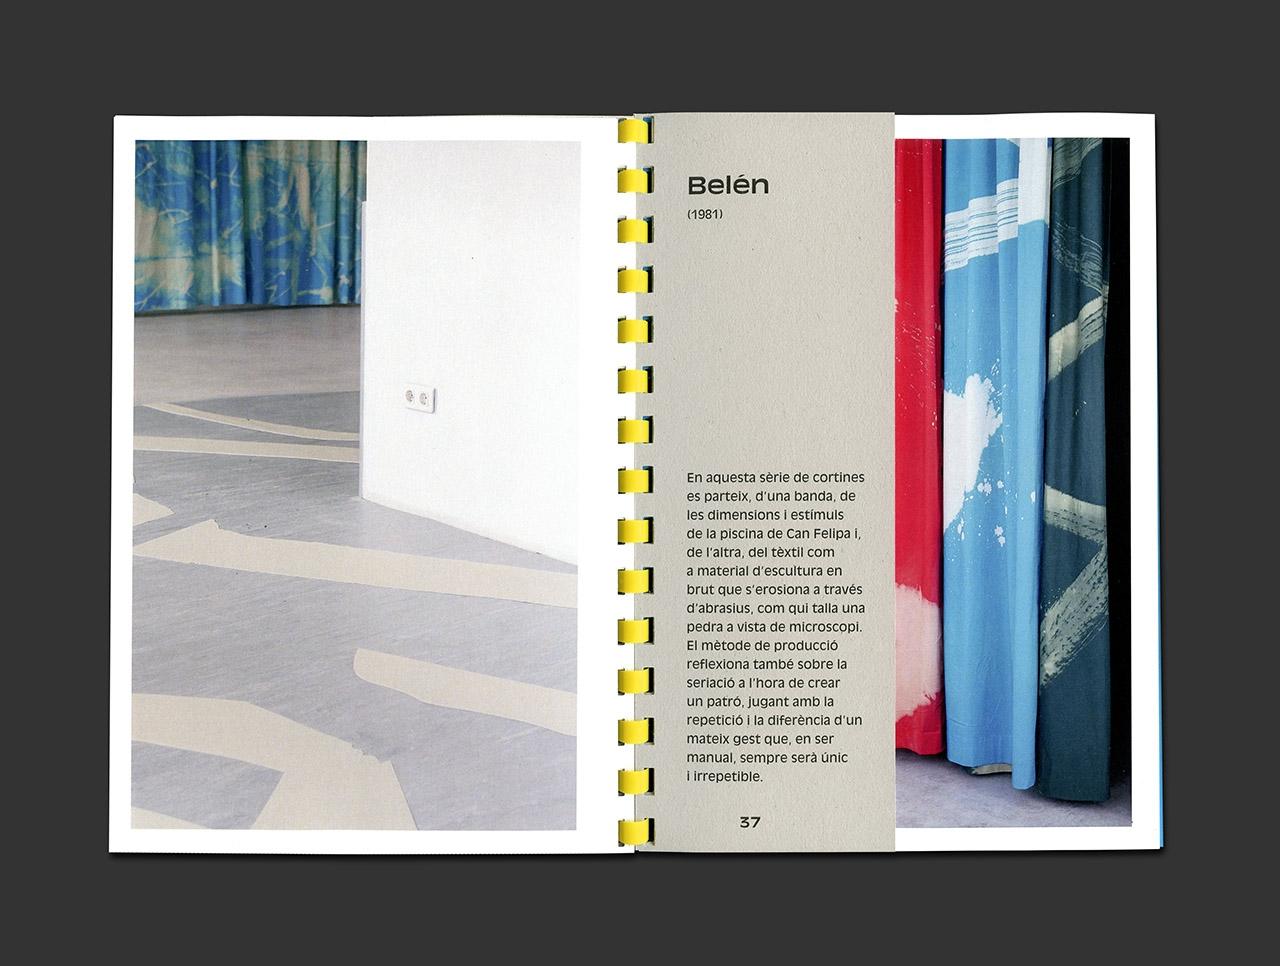 Jordi Oms Catálogo Promotora